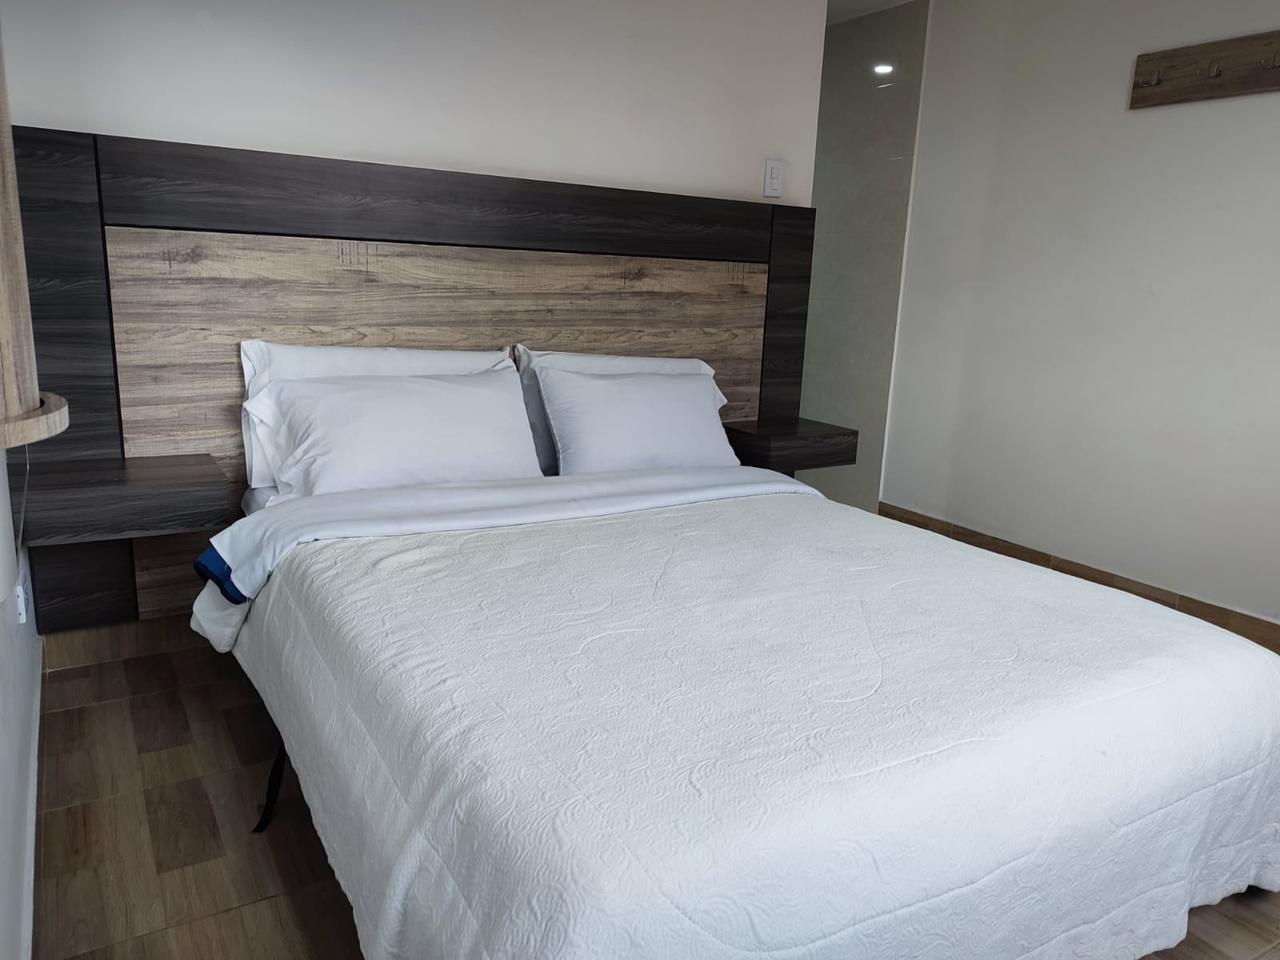 Habitación Sauna en Manantial Azul : MotelNow